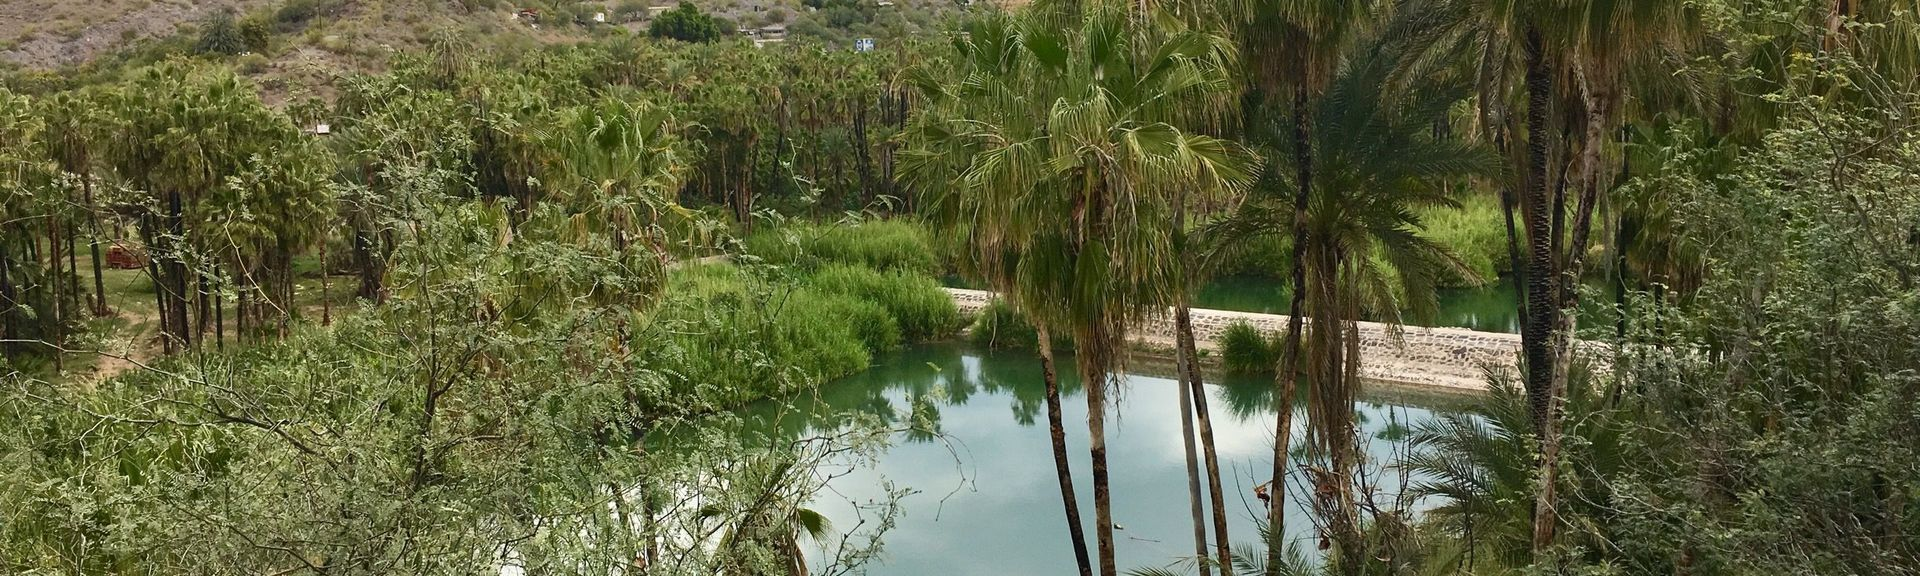 Mulegé, Baja California Sur, Mexico